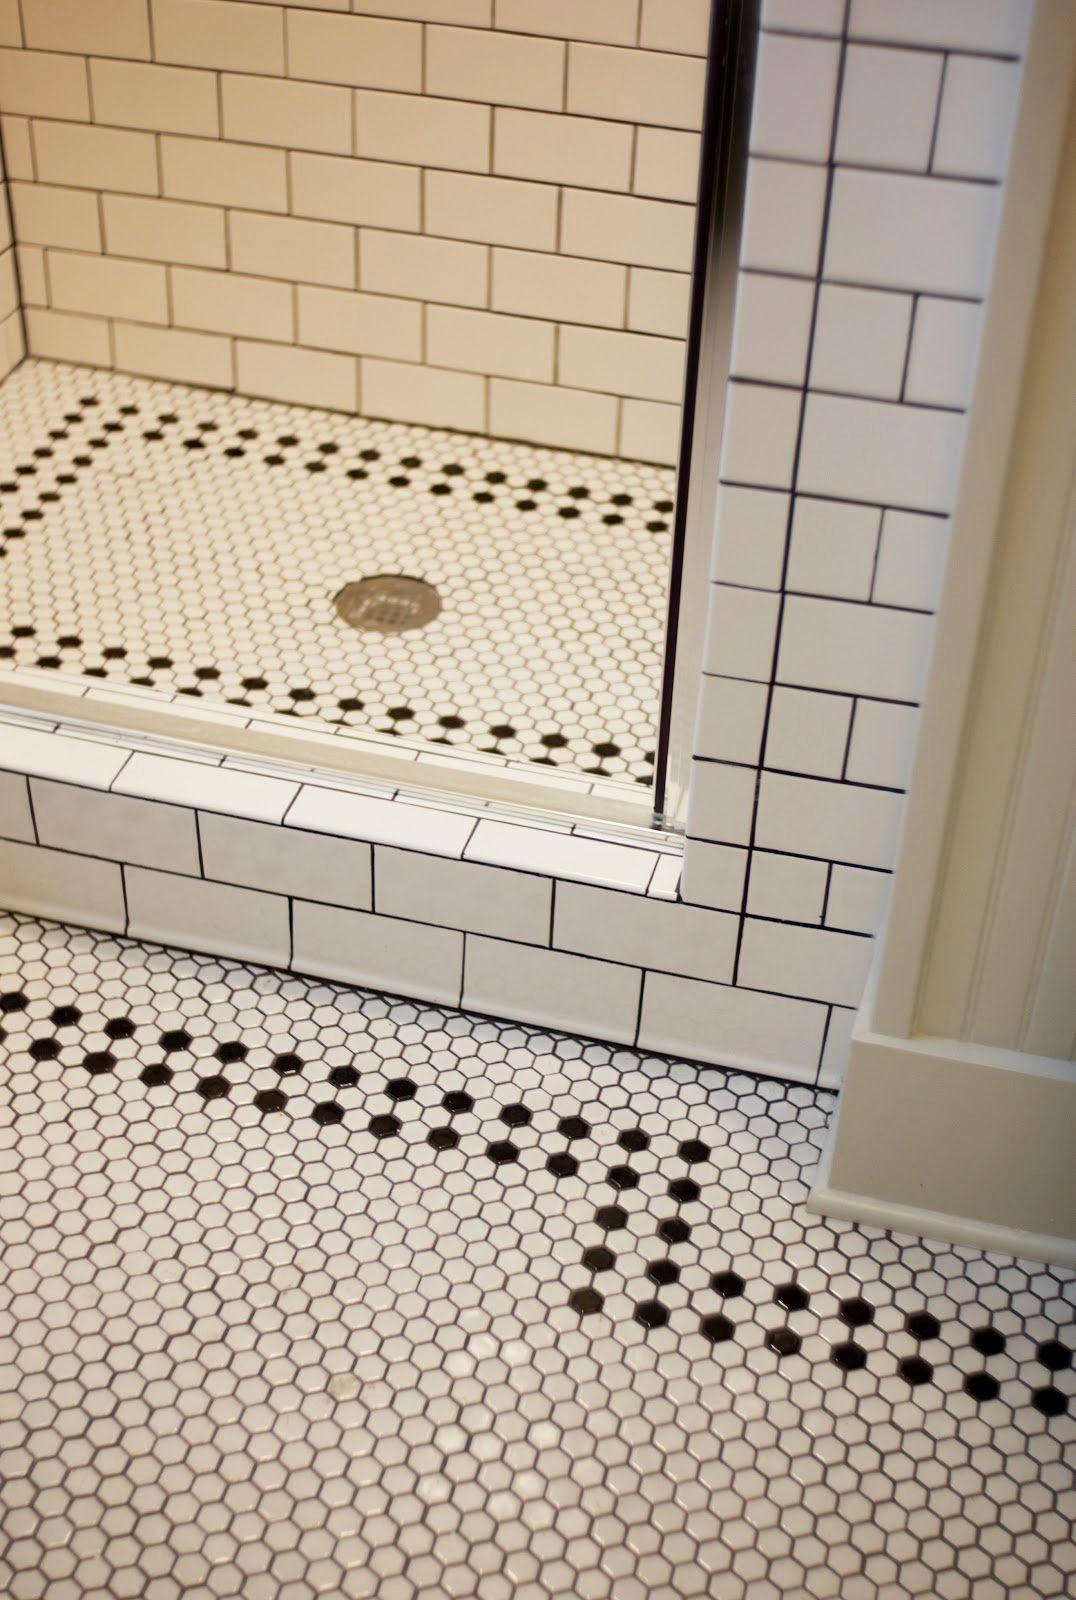 incredible tile bathroom ideas pattern-Amazing Tile Bathroom Ideas Photograph